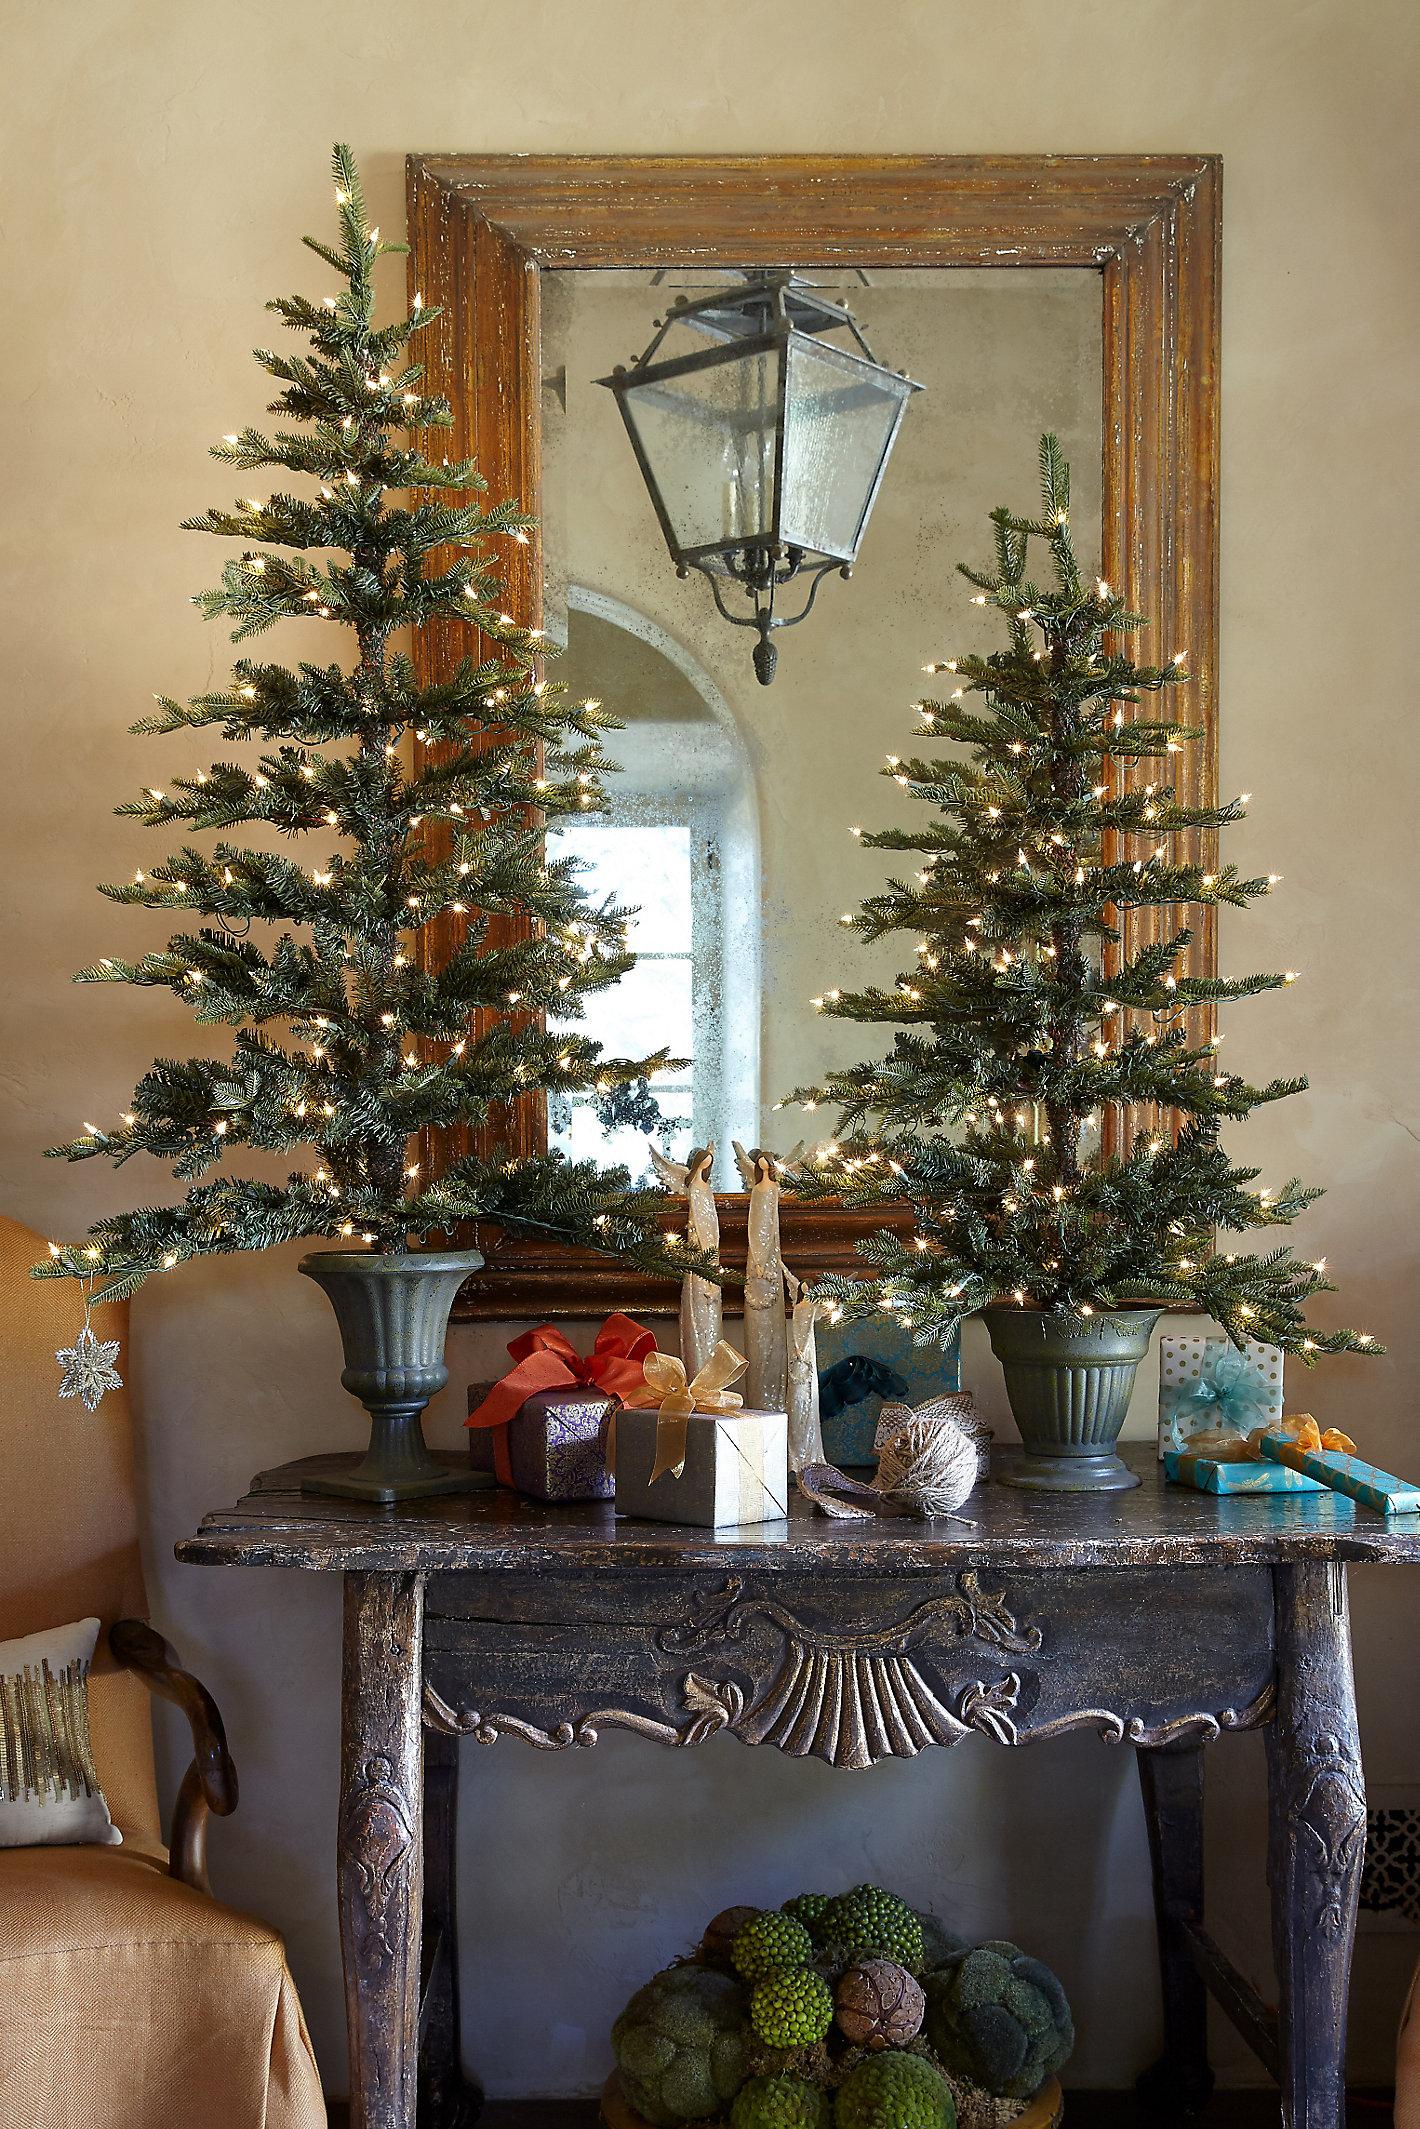 FLAT HOLIDAY PRELIT TREE